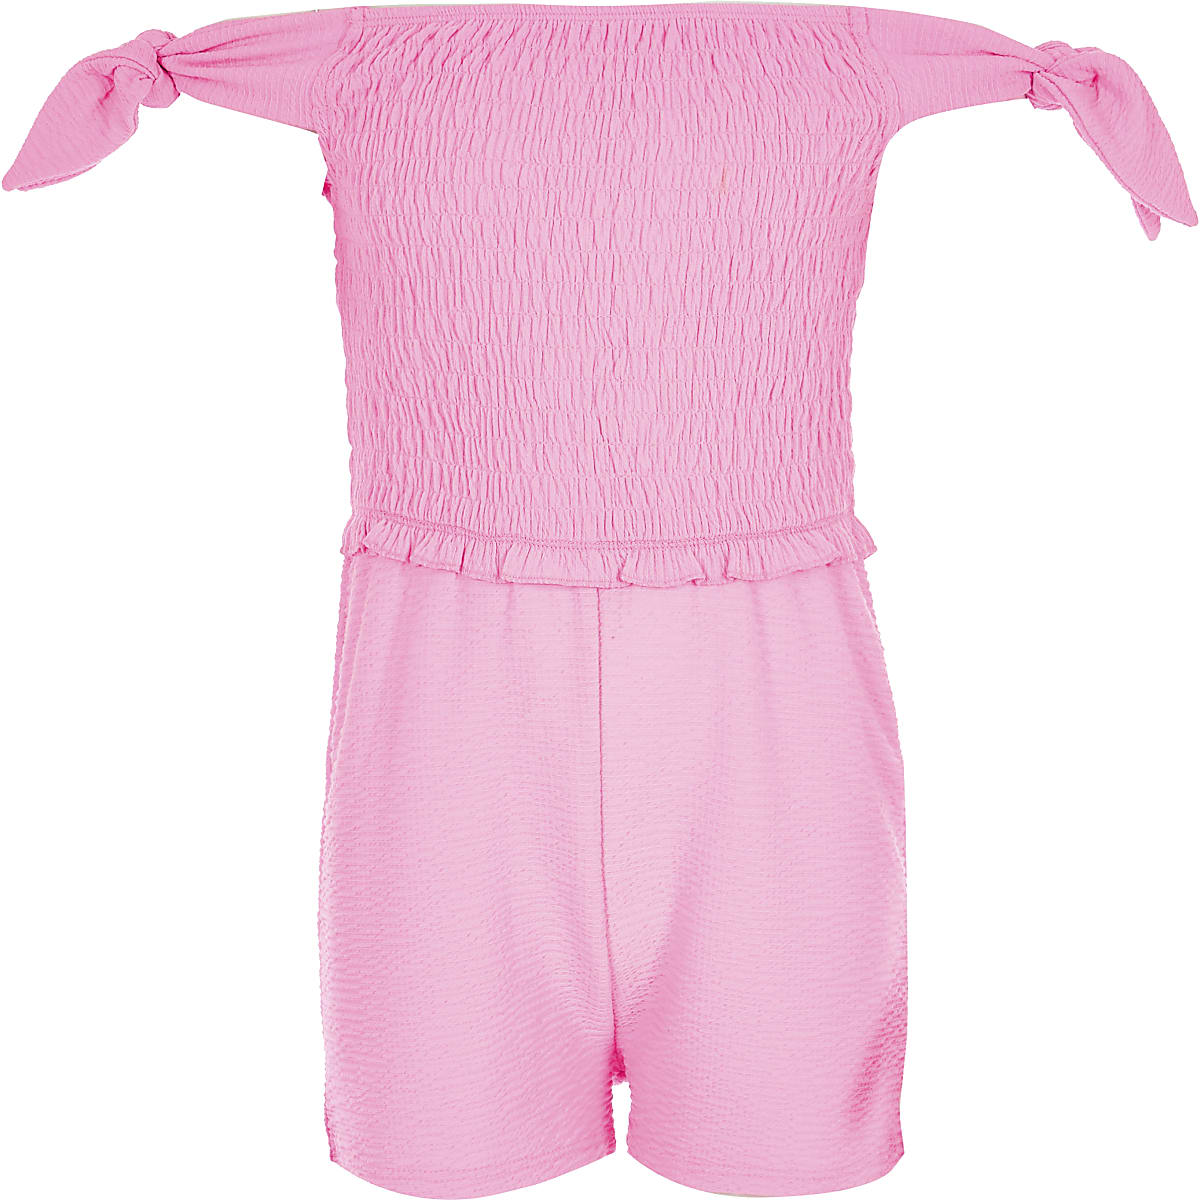 Girls neon pink shirred romper